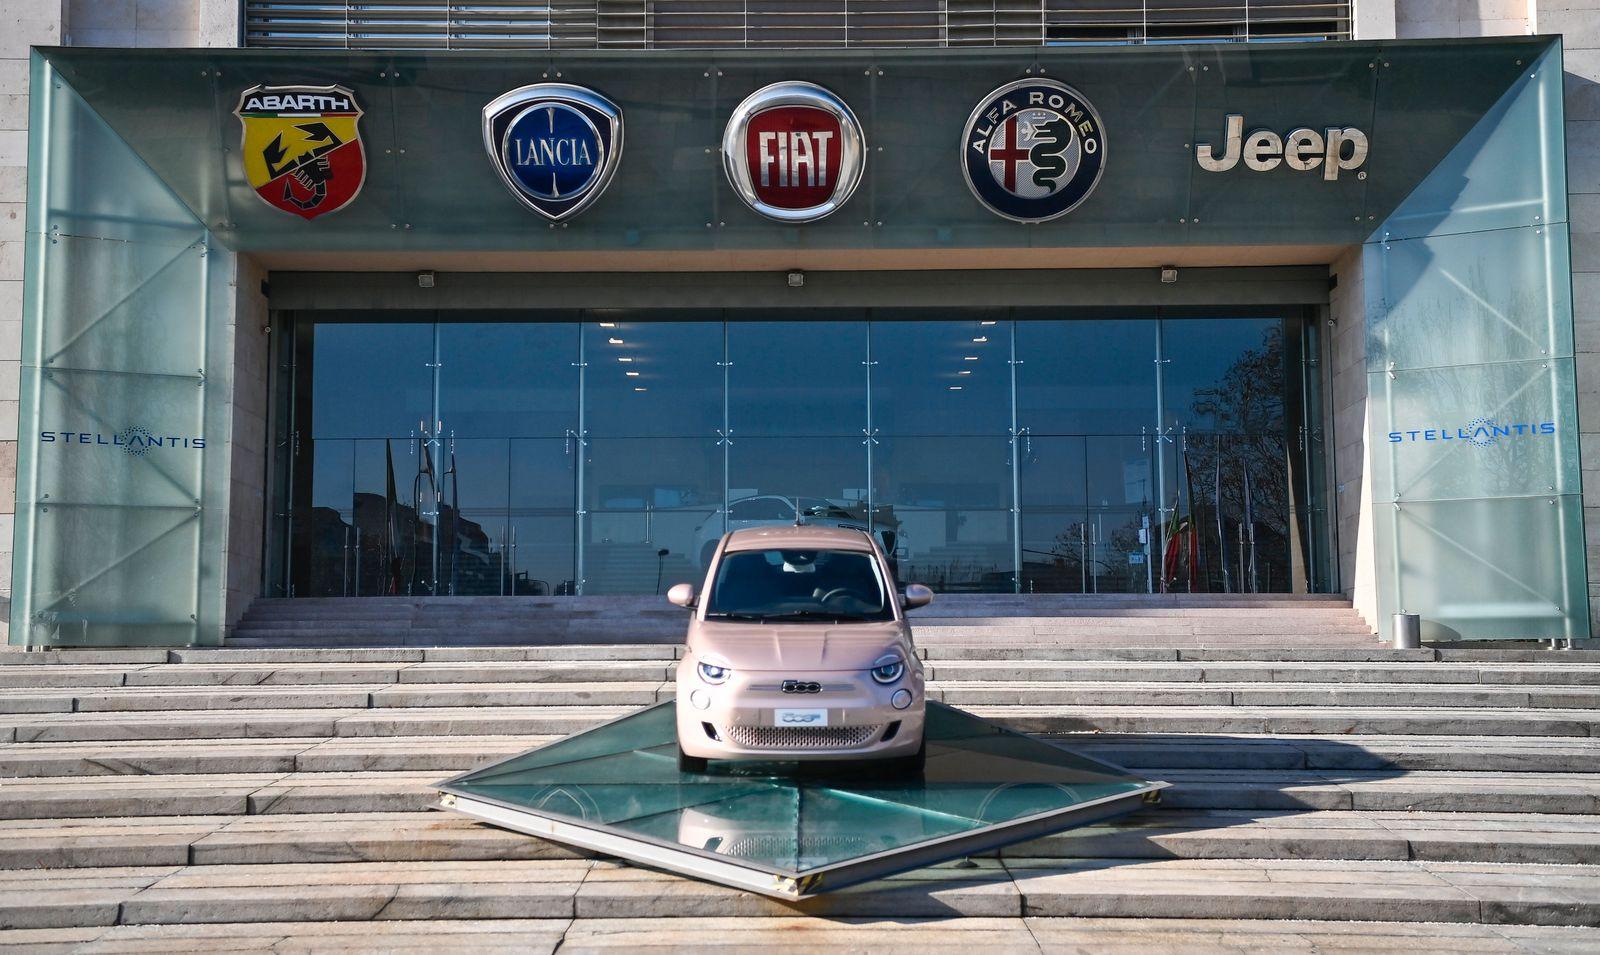 Italy Auto Industry Stellantis